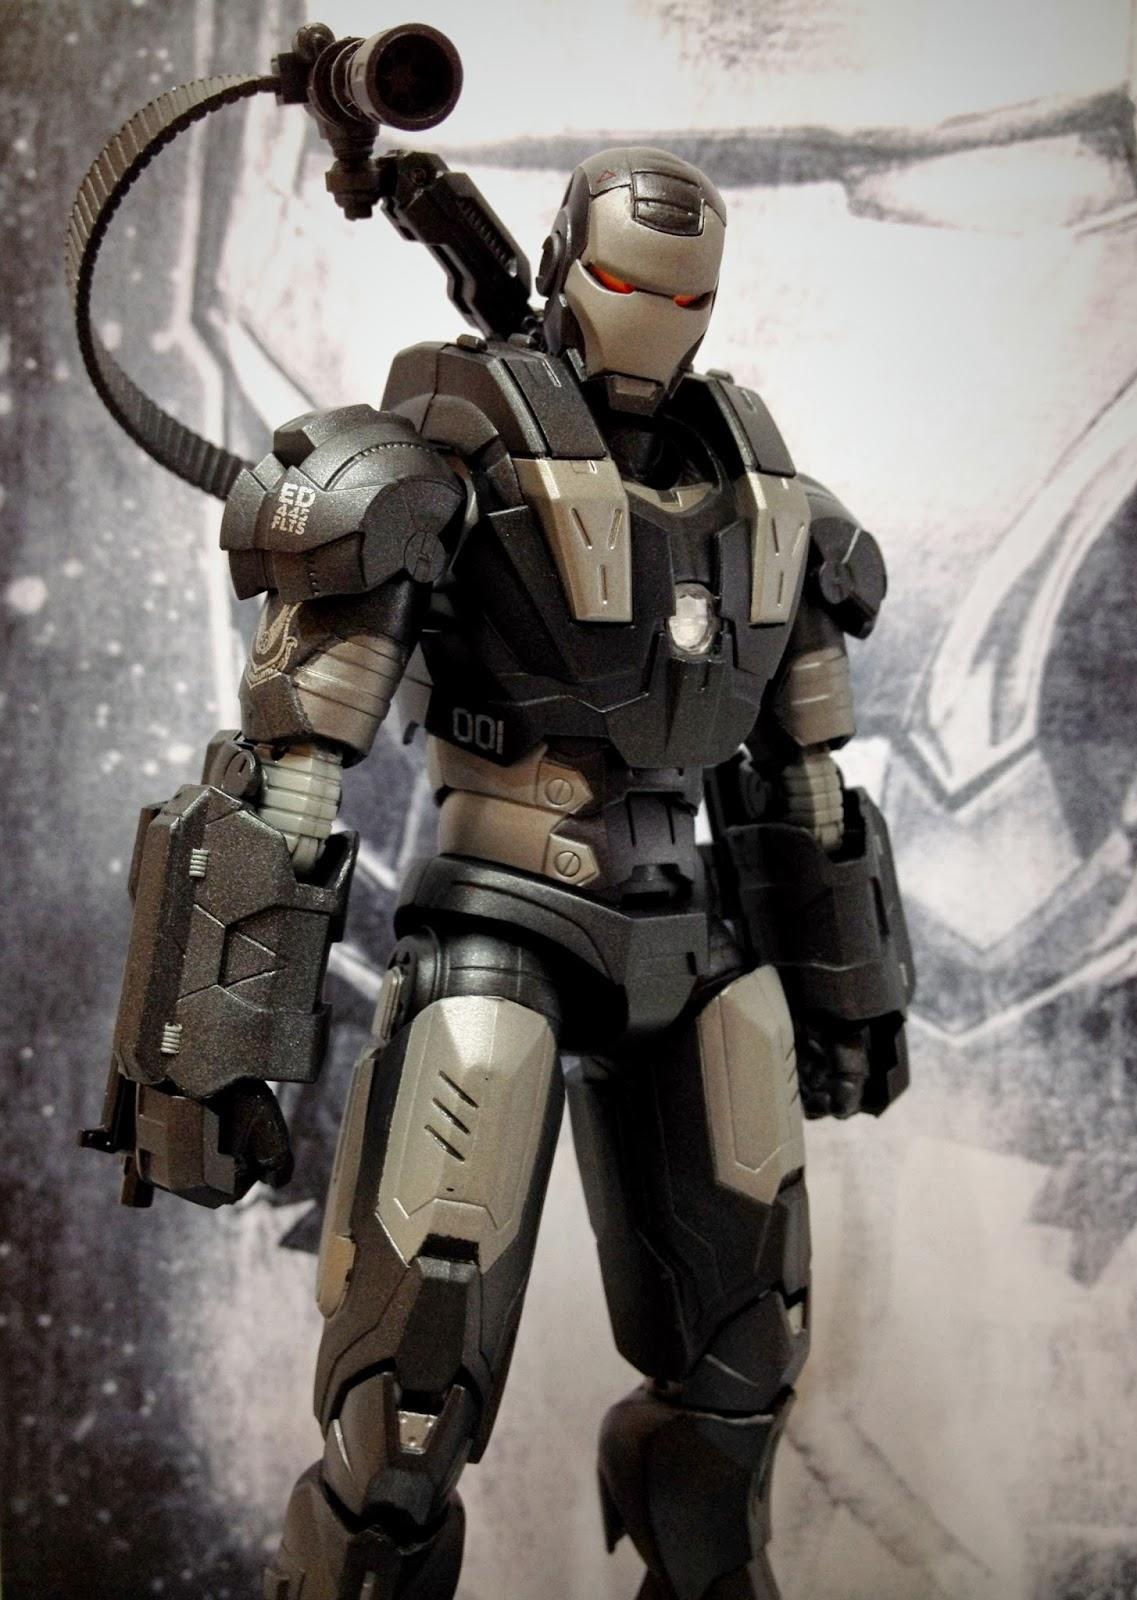 combos action figure collection war machine iron man 2